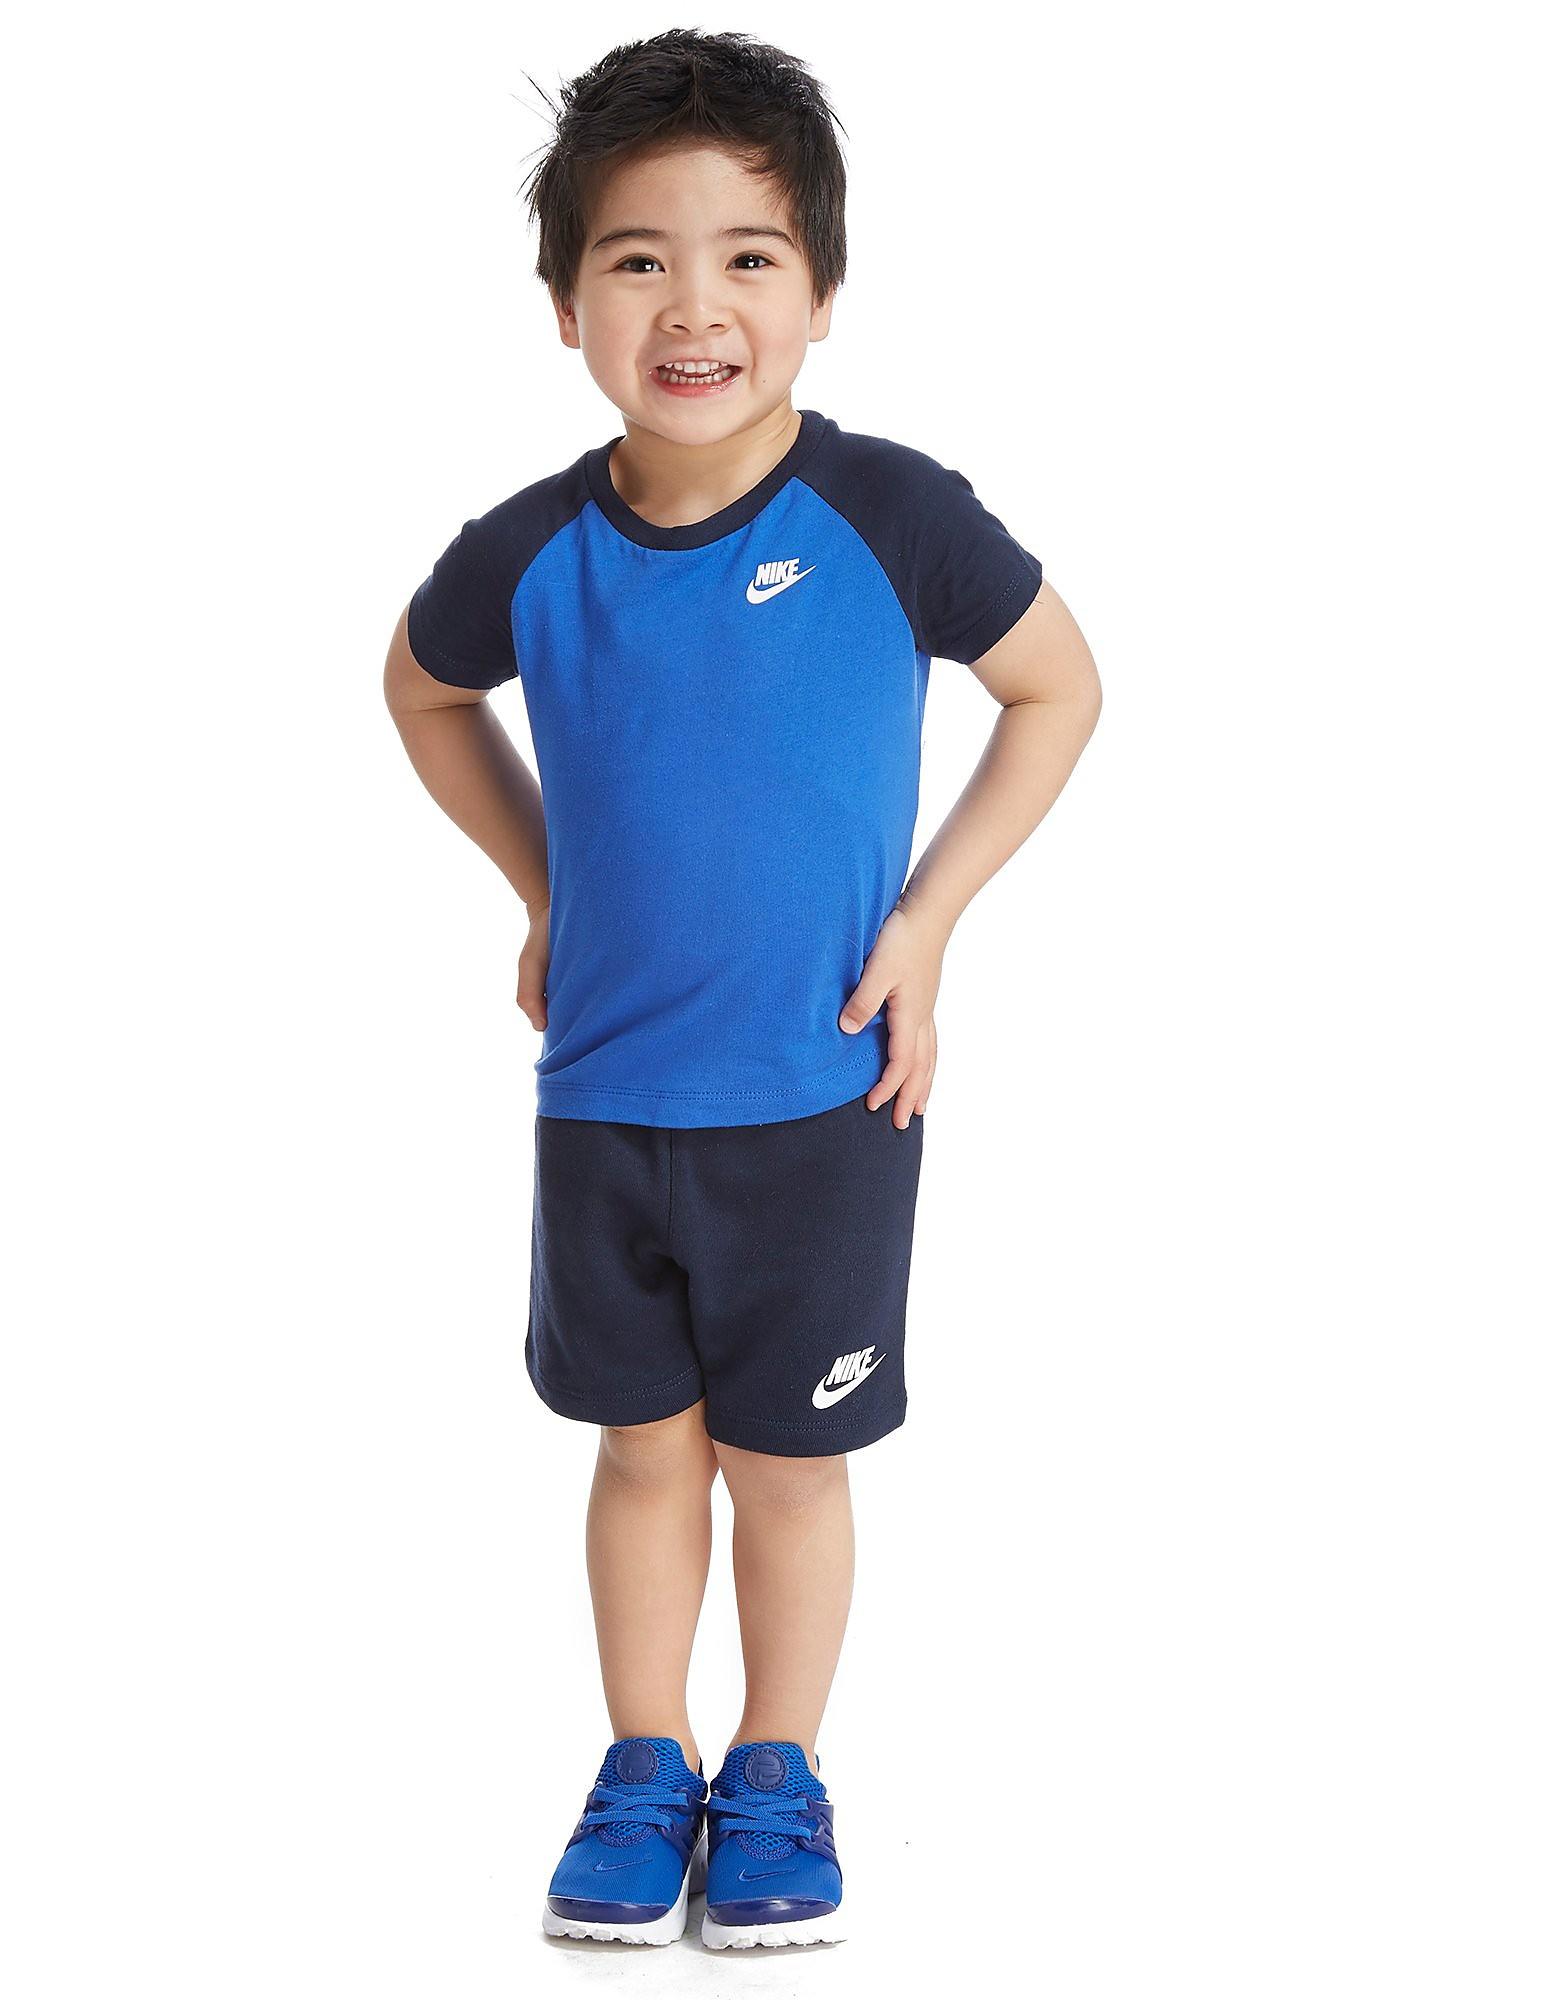 Nike T-Shirt/Shorts Set Infant